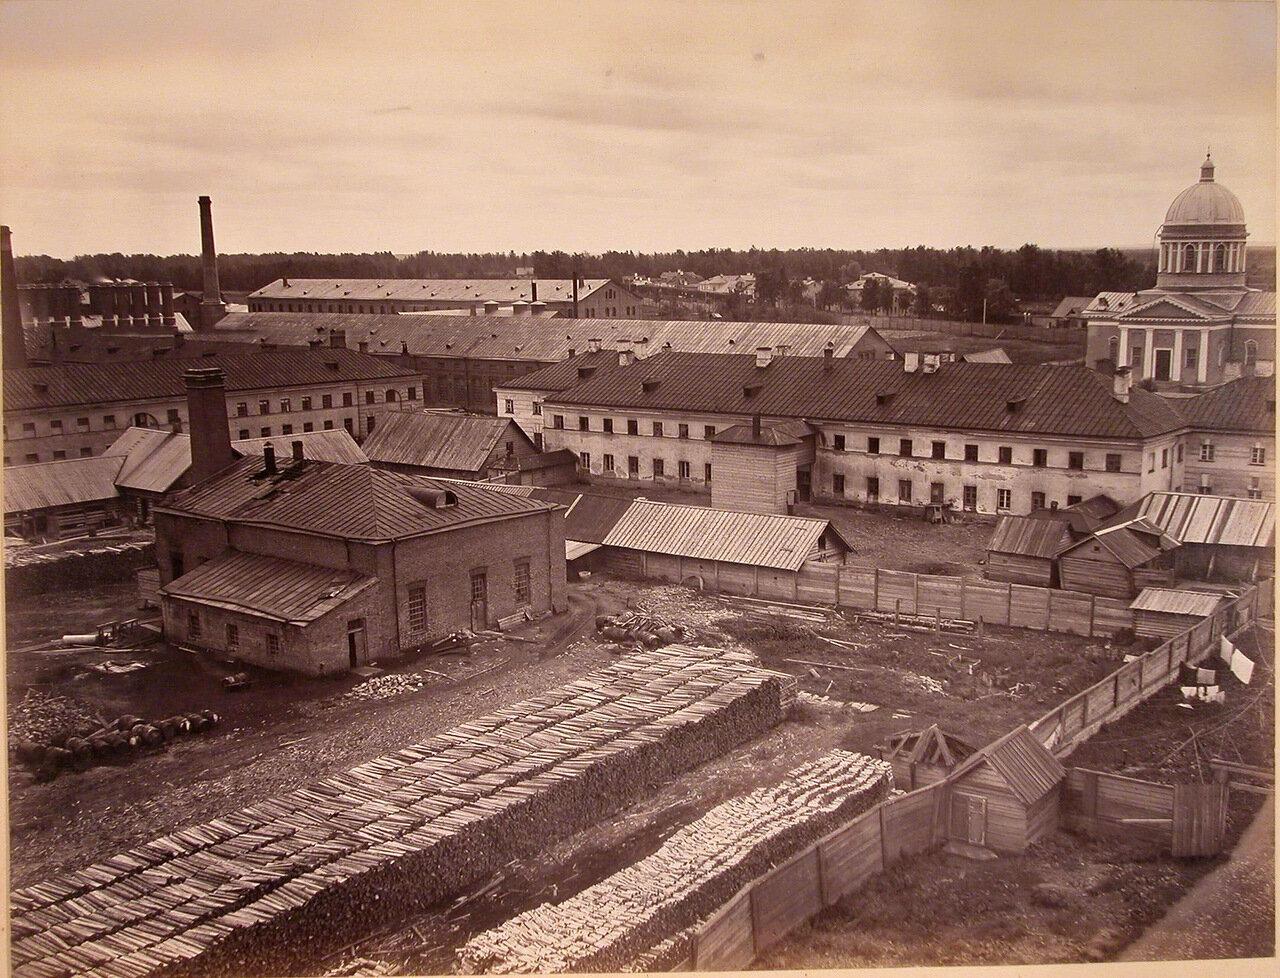 02. Общий вид помещений и территории завода конца 1860-х годов